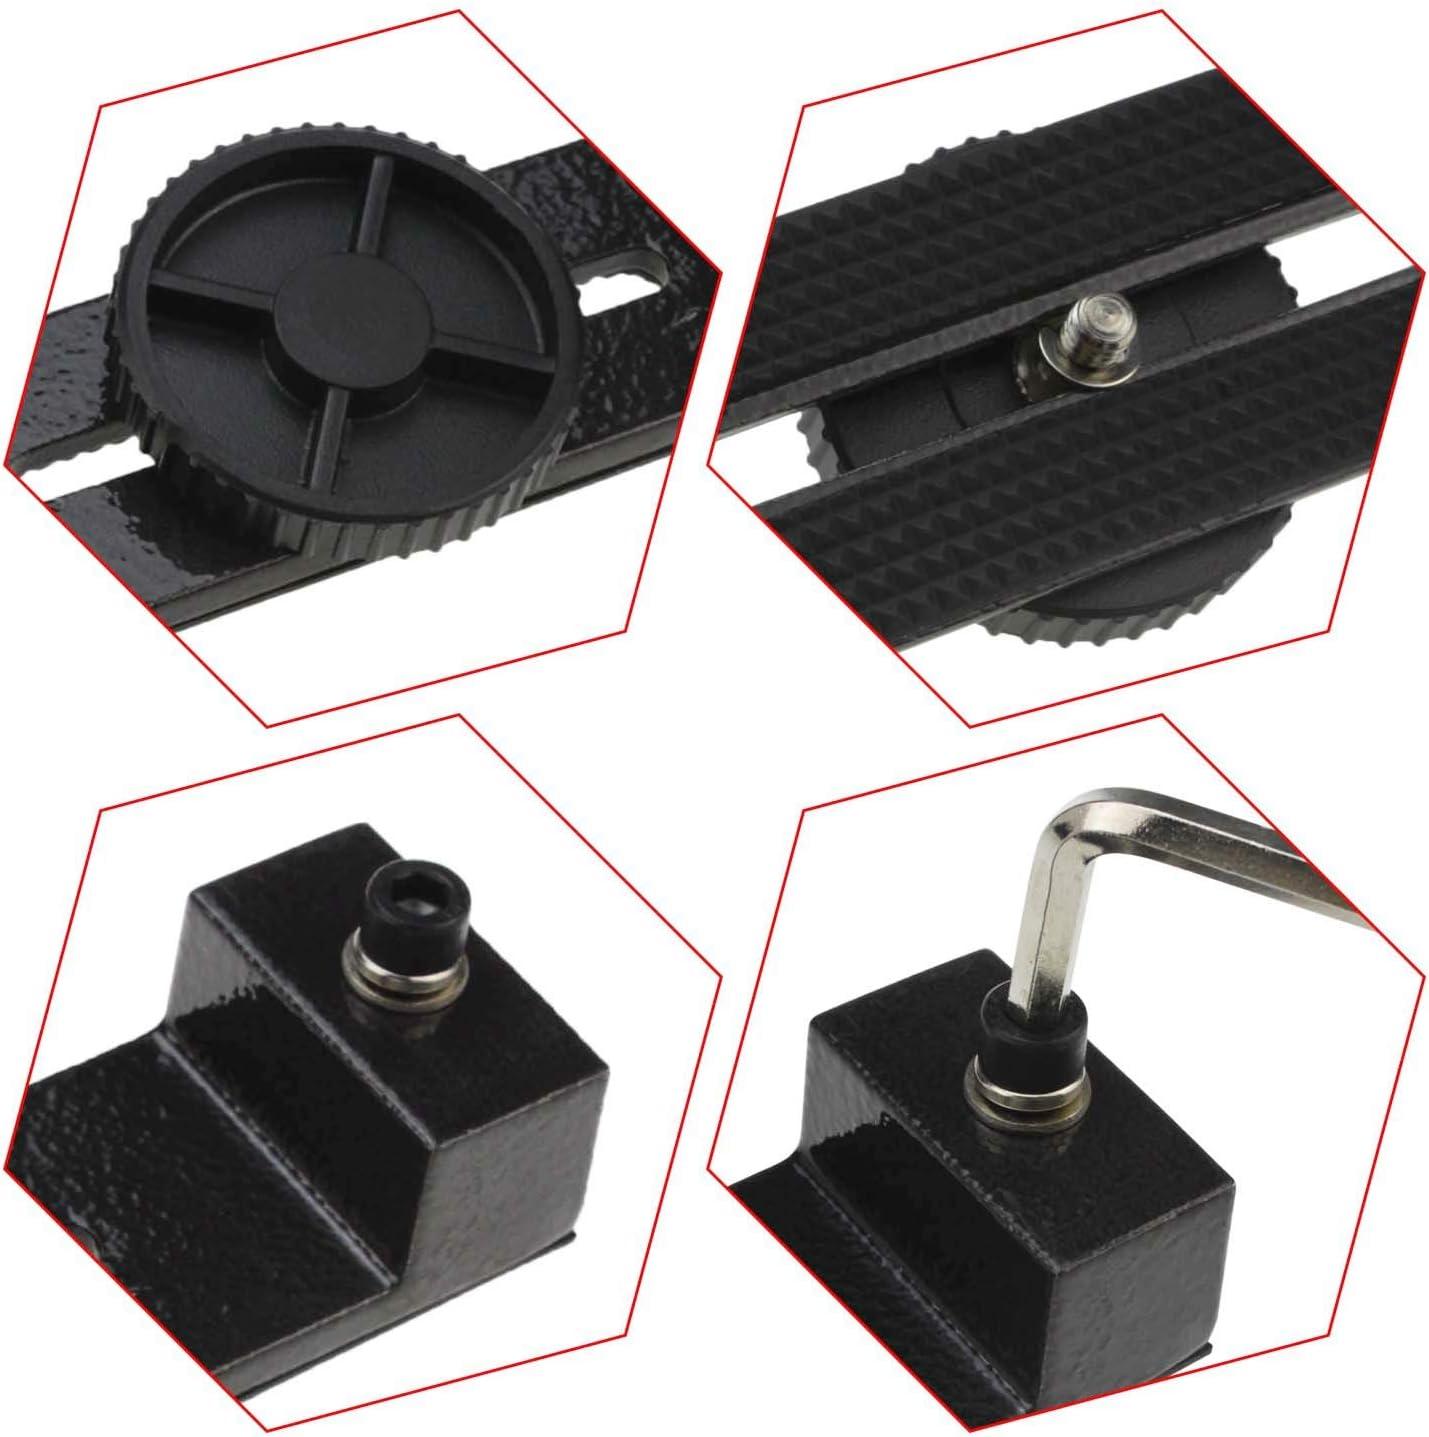 for The Adaptation of Instruments with 1//4-20 Camera Thread to The AZ-3 Astromania AZ3 Camera Thread Adaptor